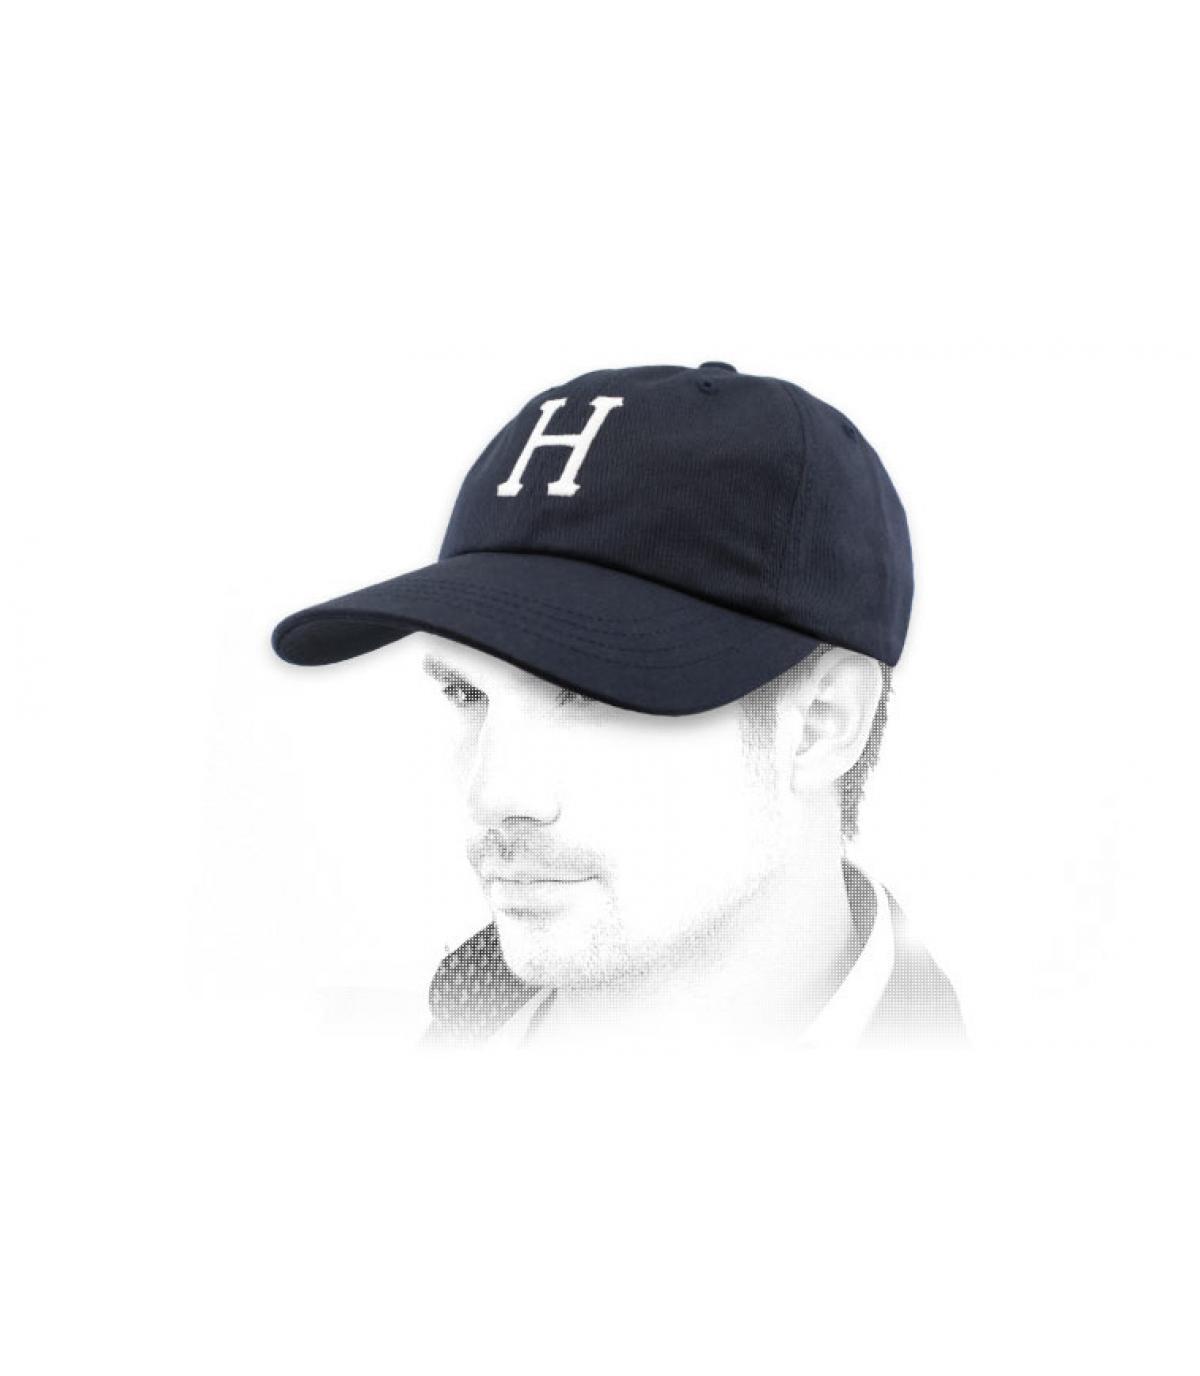 berretto H blu navy